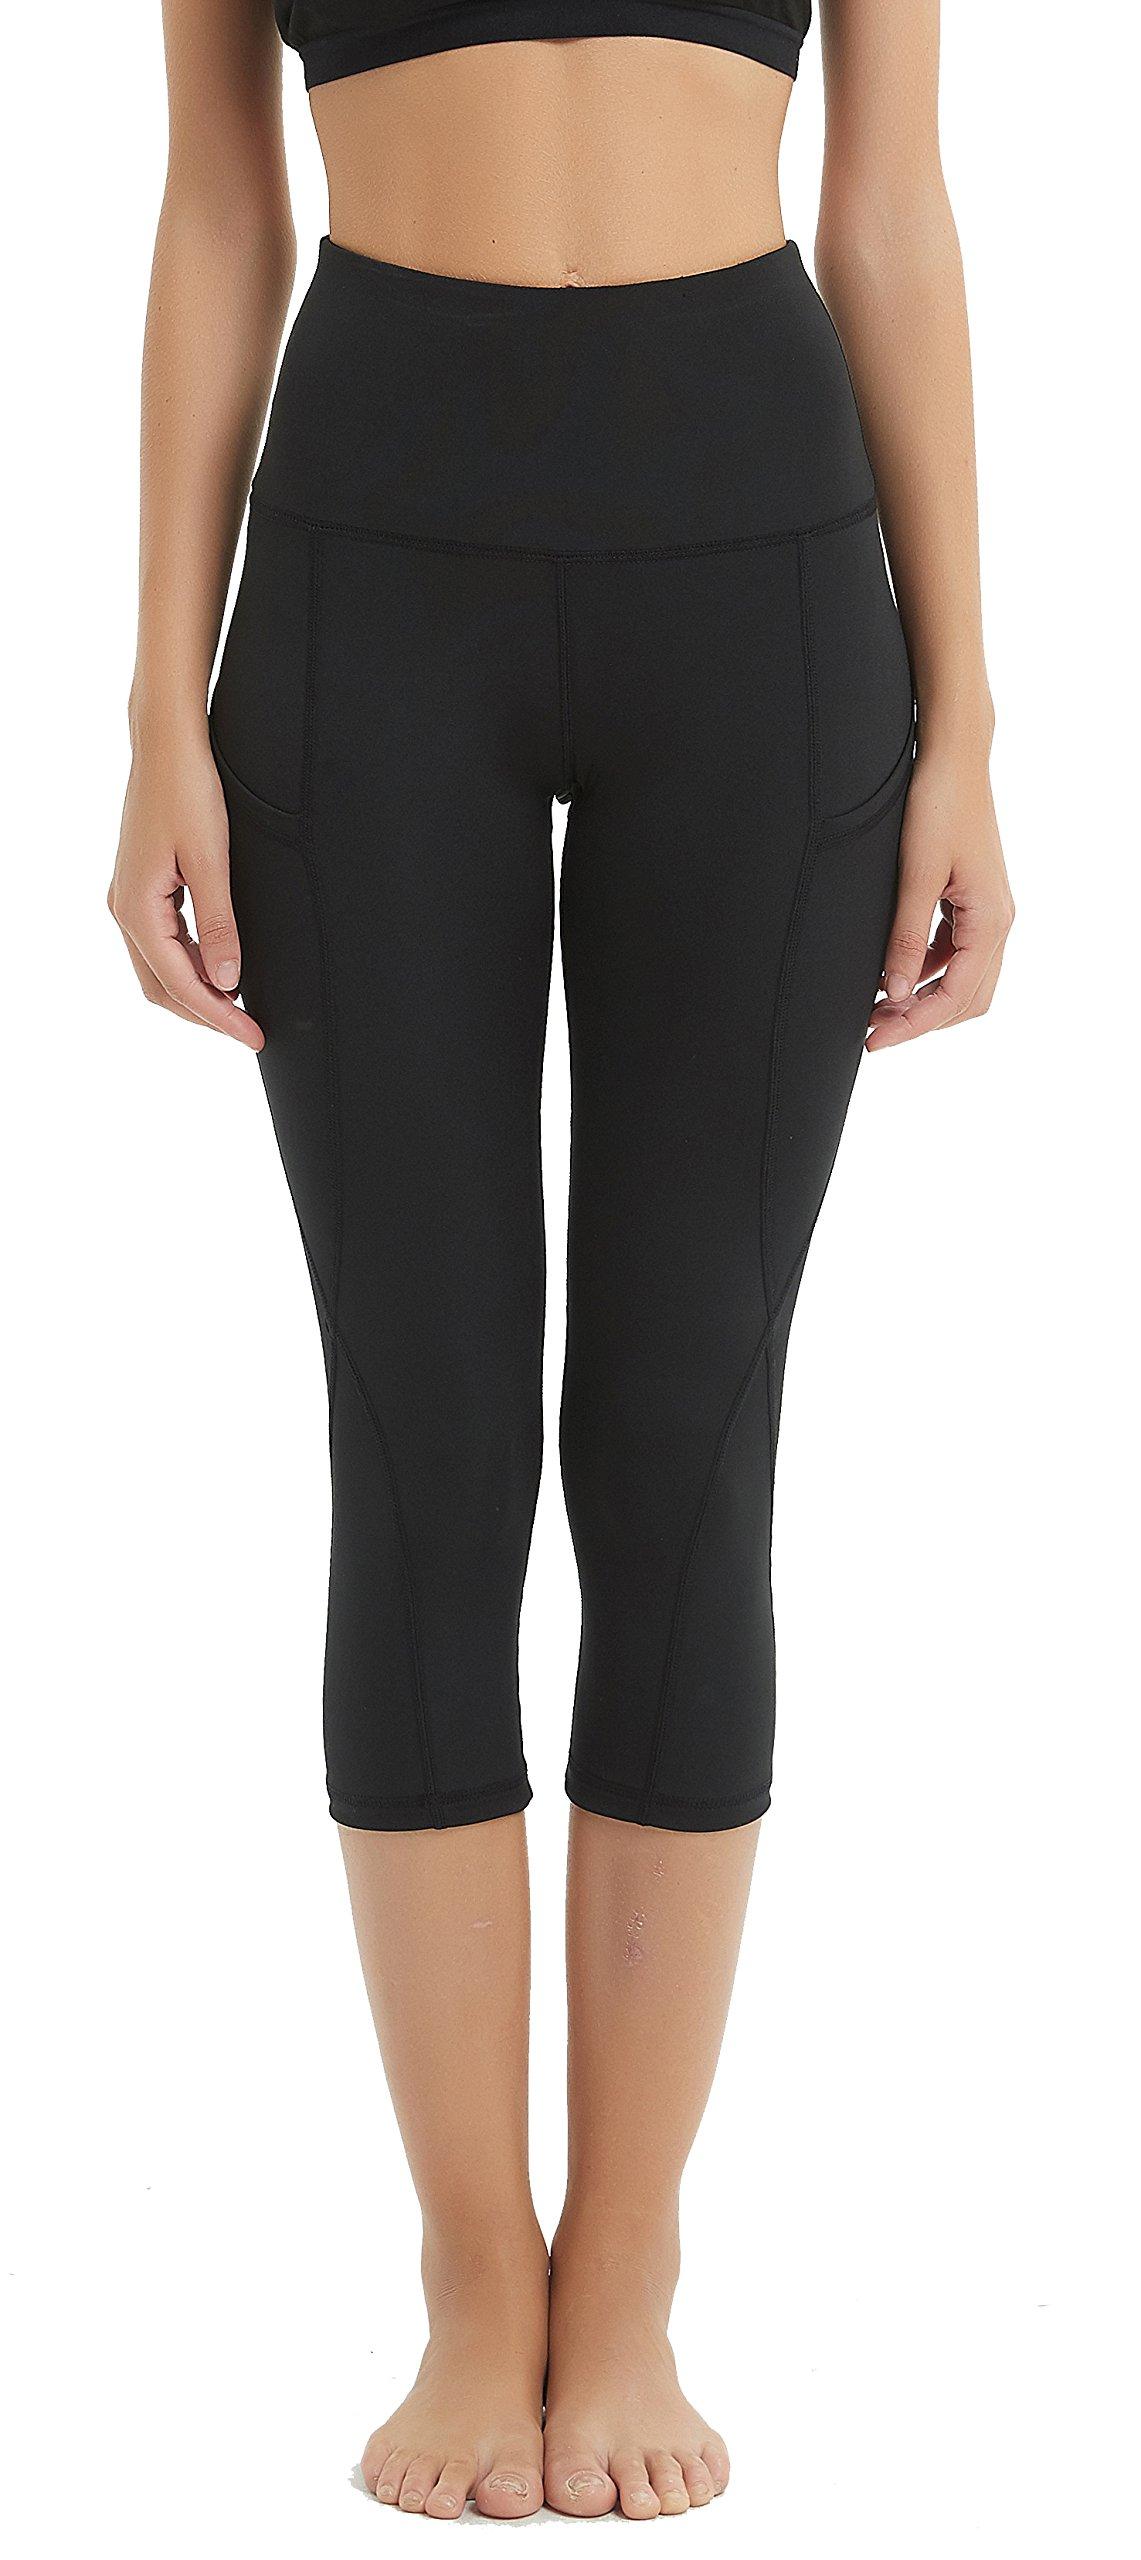 Lemorecn Women's High Waist Out Pocket UPF 50+ Capris Swim Pants Tights Surfing Leggings Sun Protection(6002black-XL)